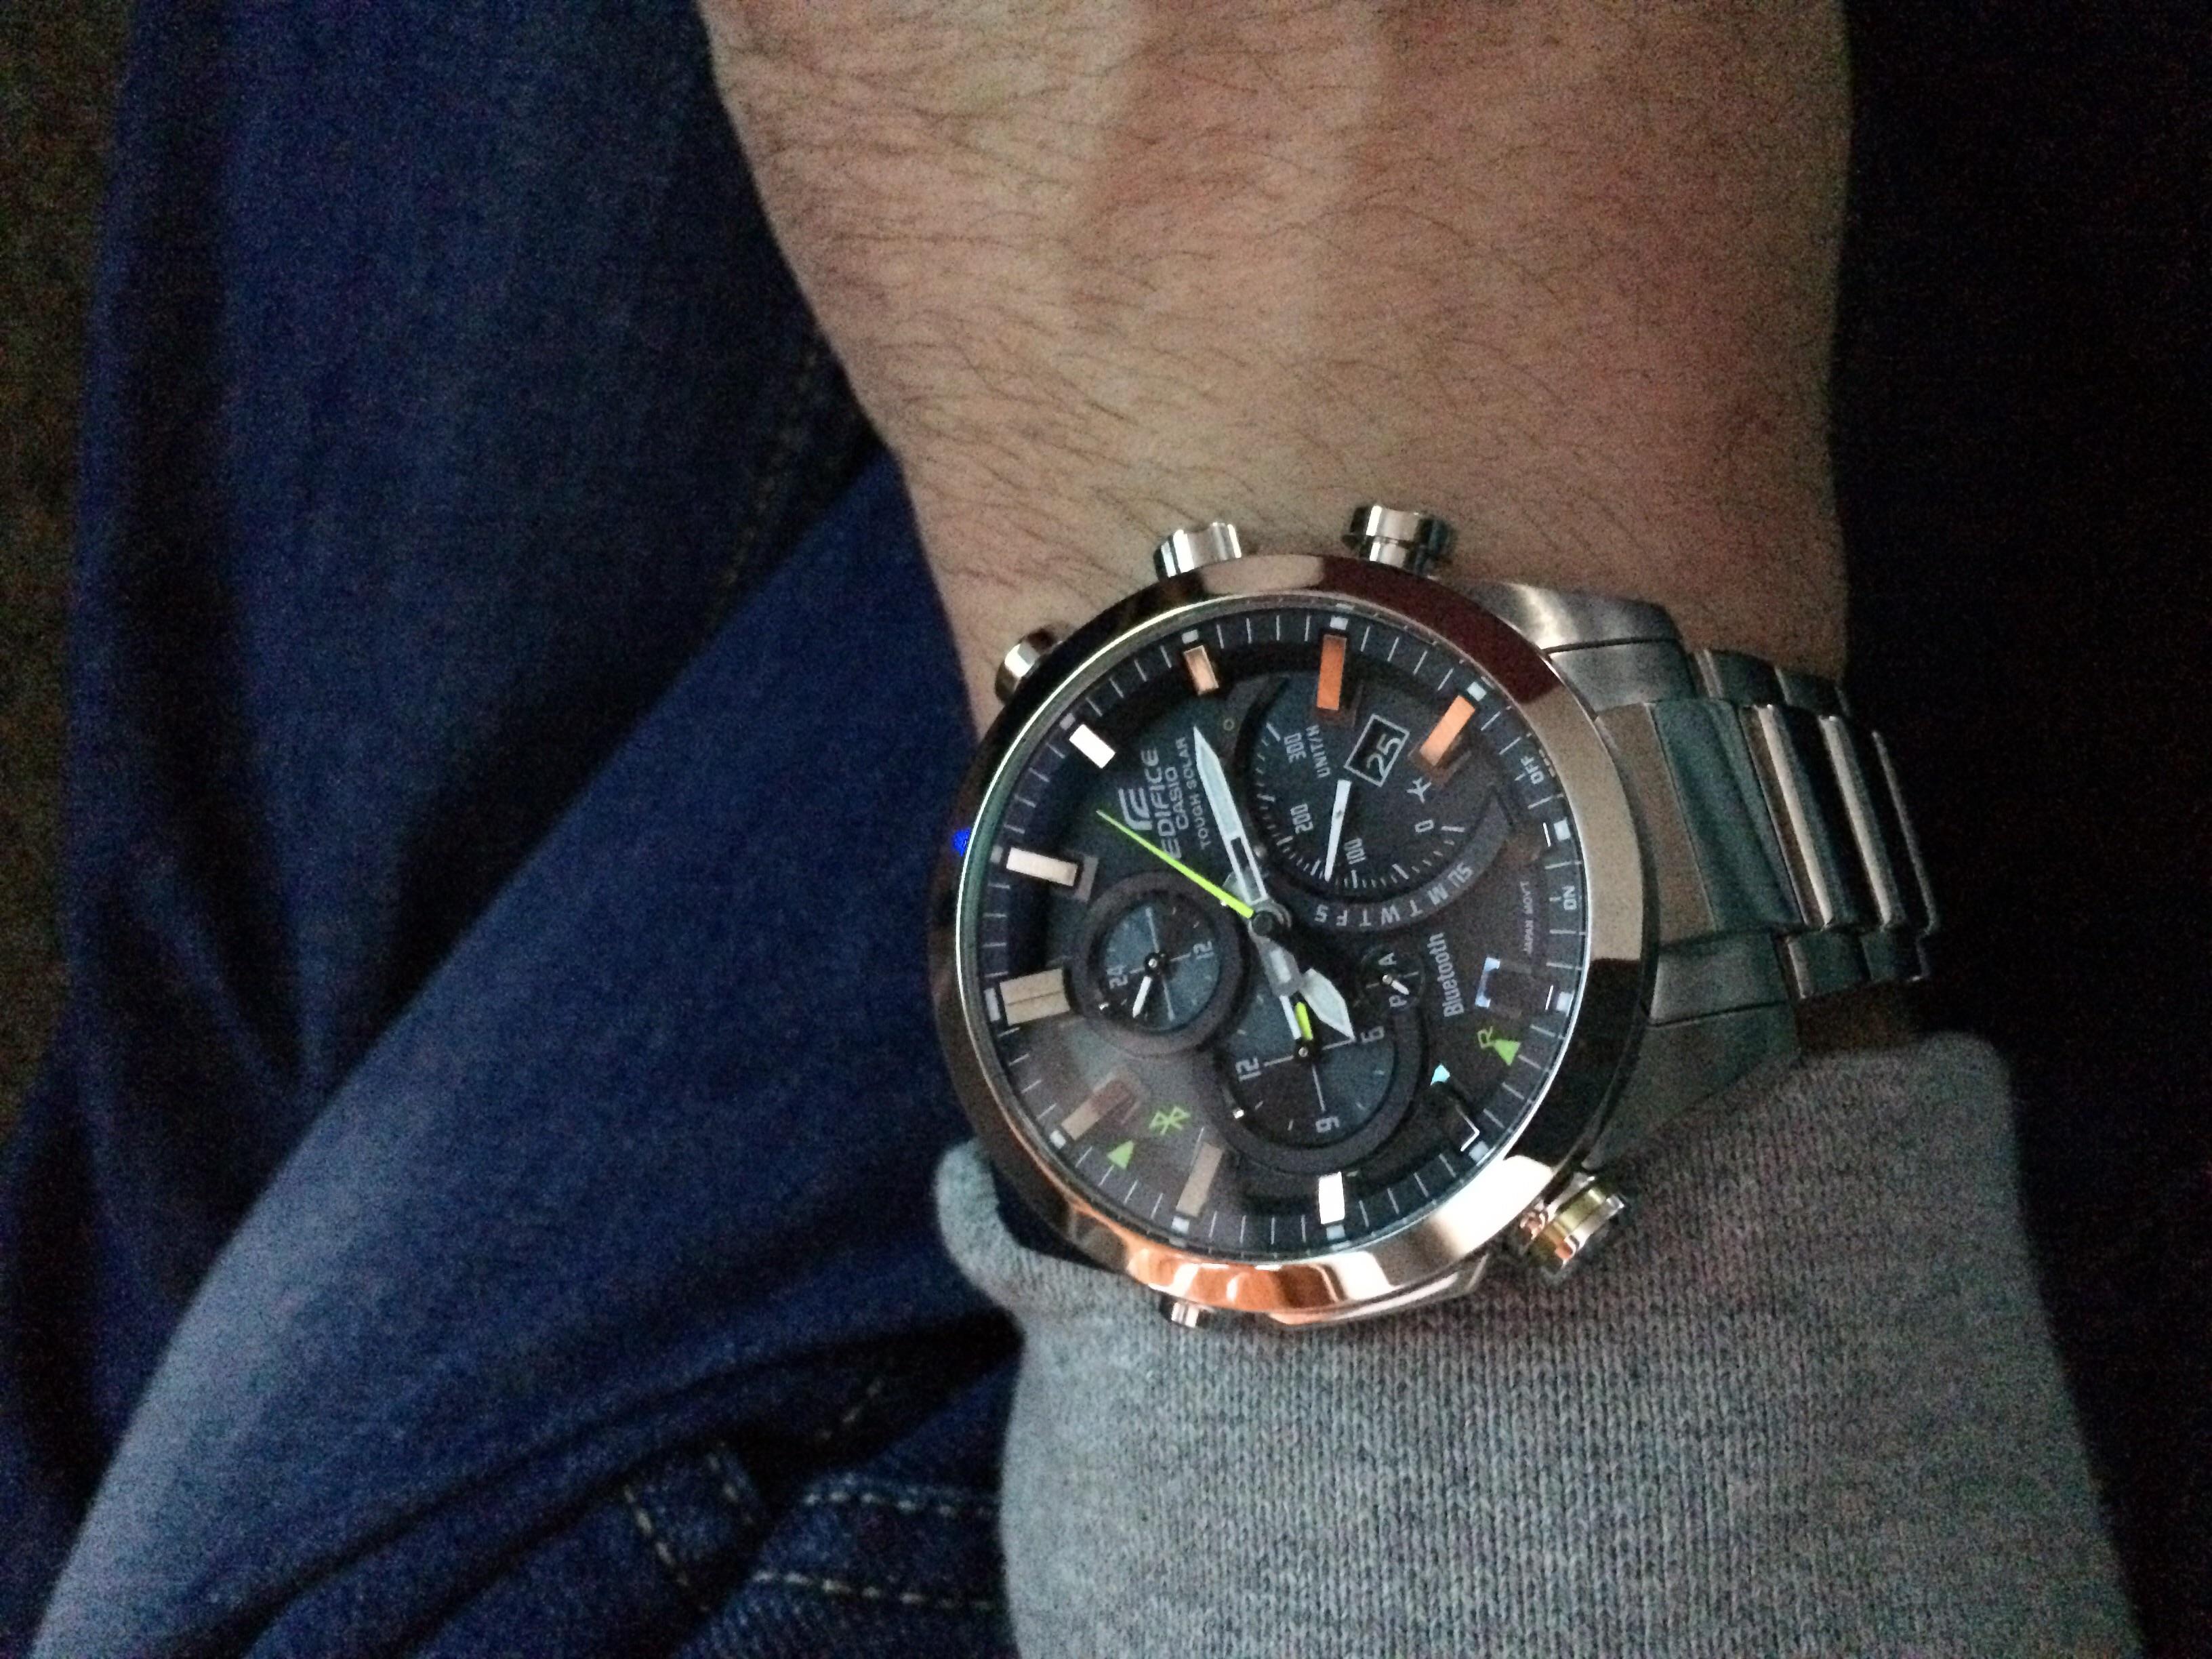 Gents Casio Edifice Time Traveller Bluetooth Hybrid Smartwatch Alarm